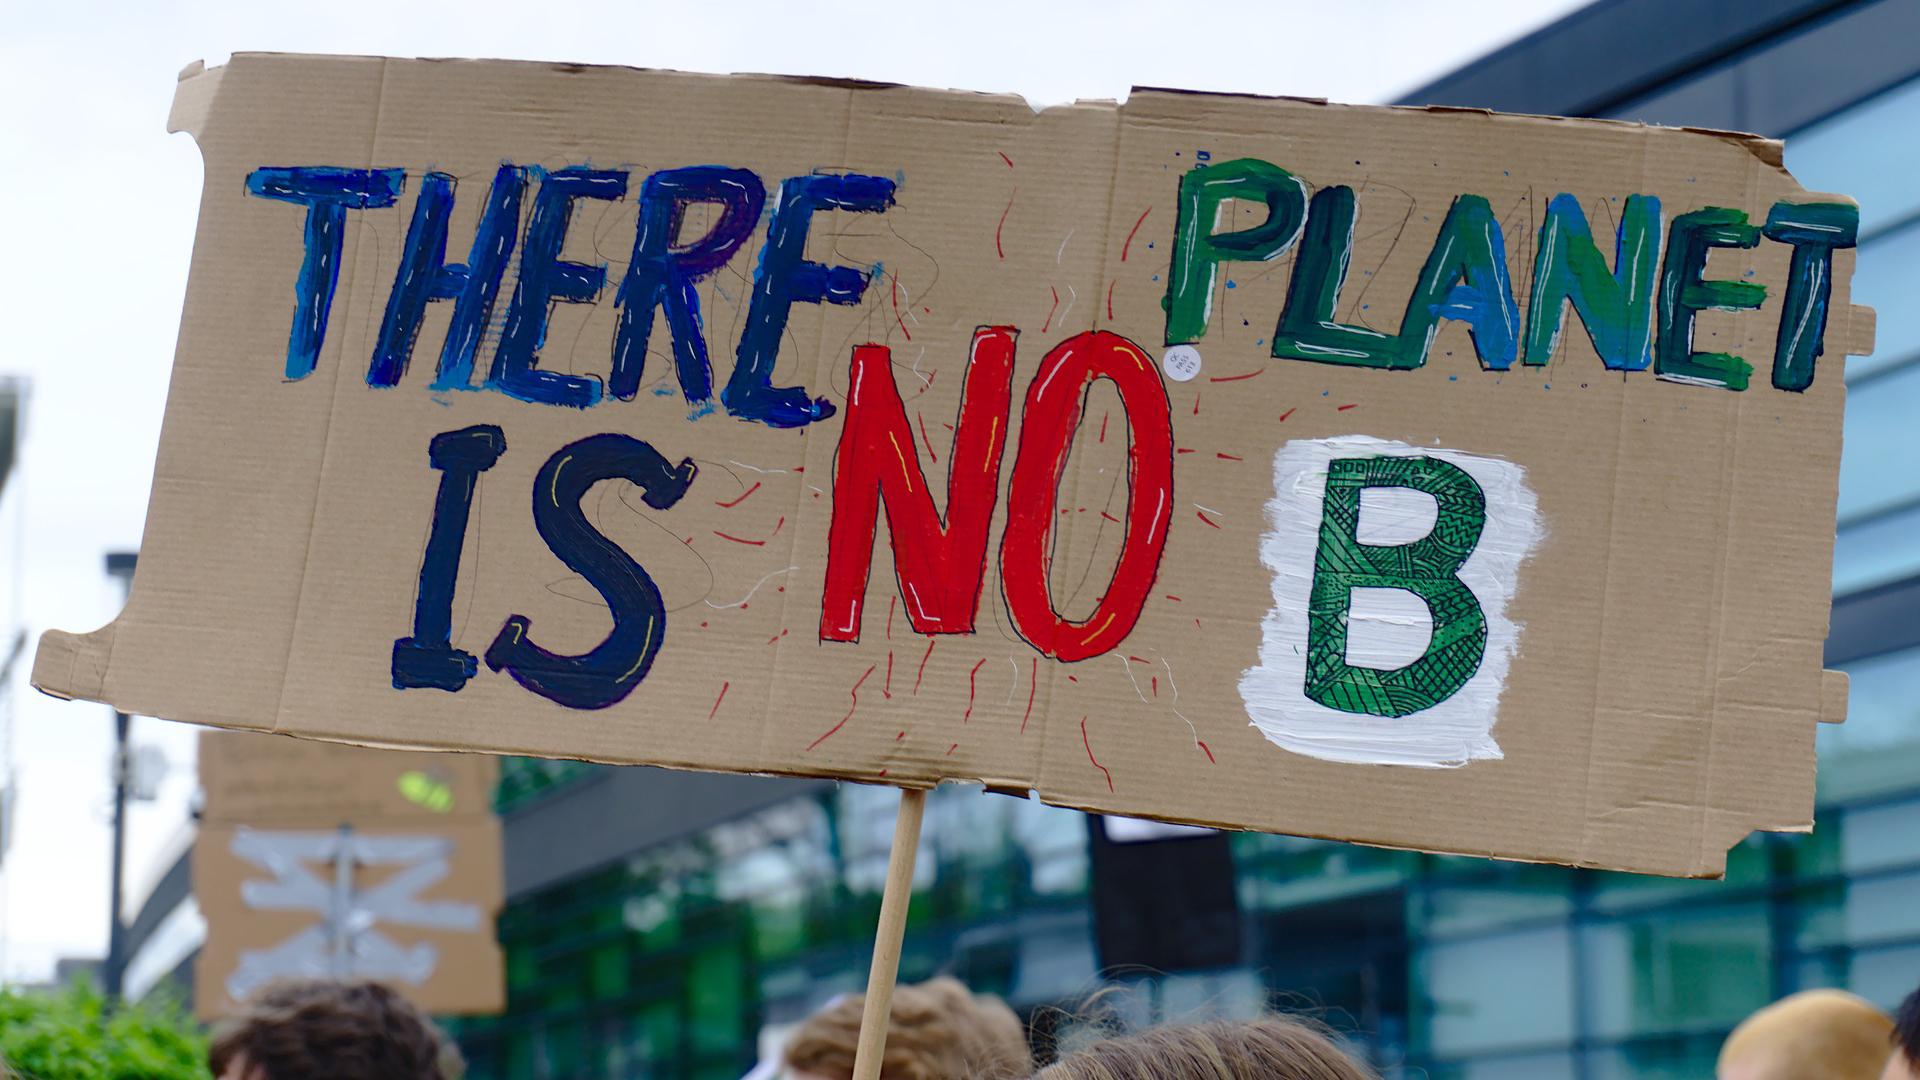 vaga mundial pel clima